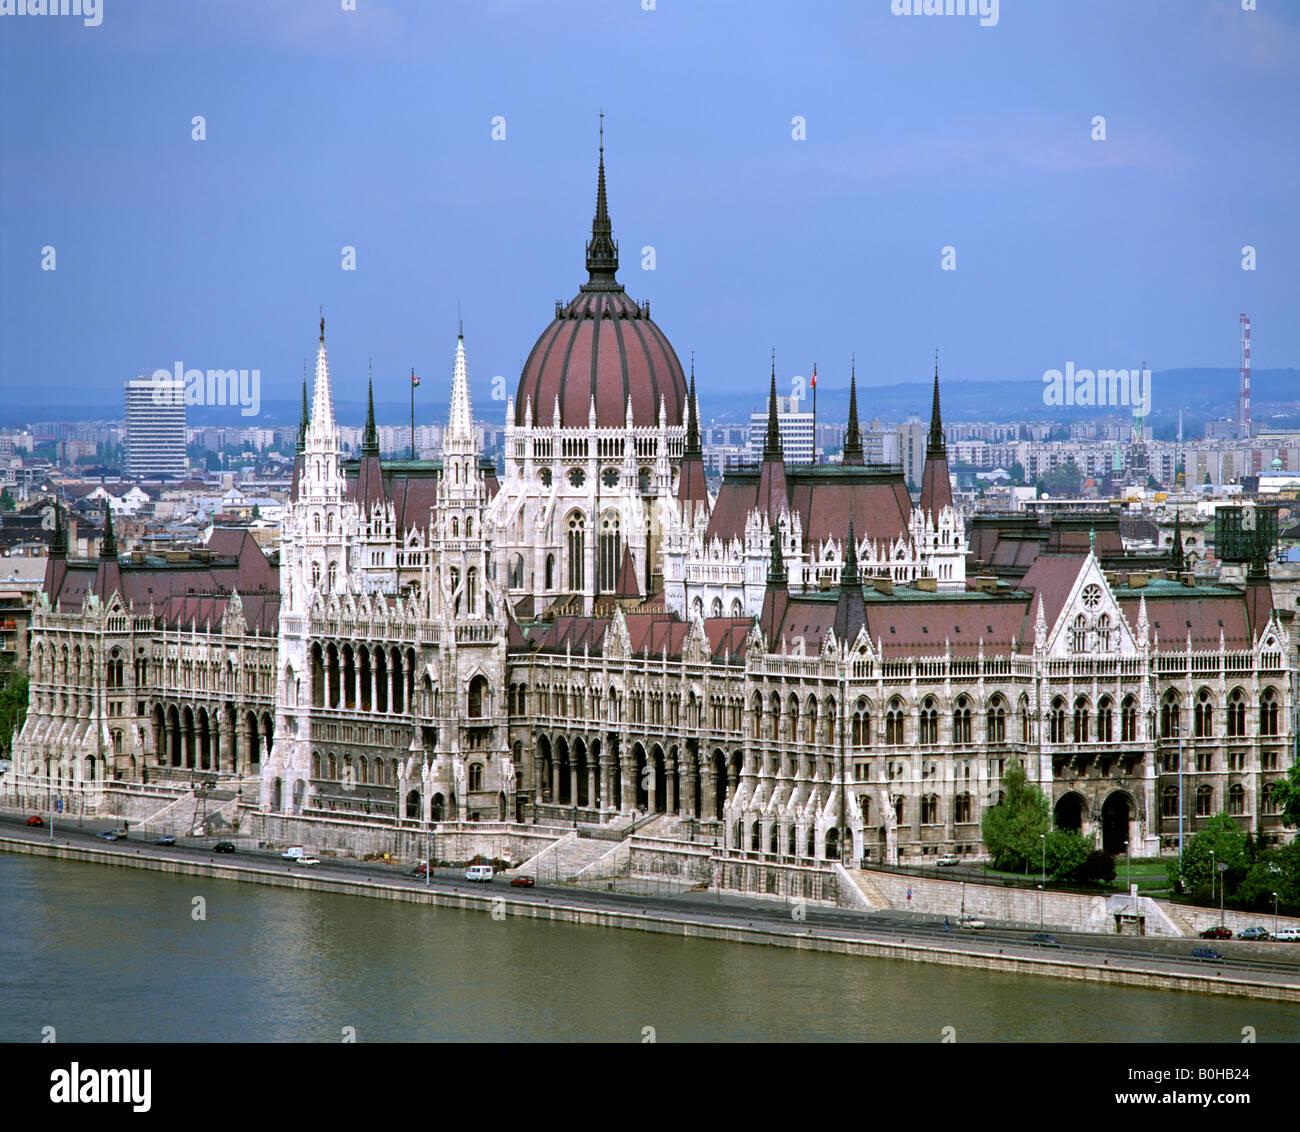 Parlamentsgebäude an der Donau, Budapest, Ungarn Stockbild